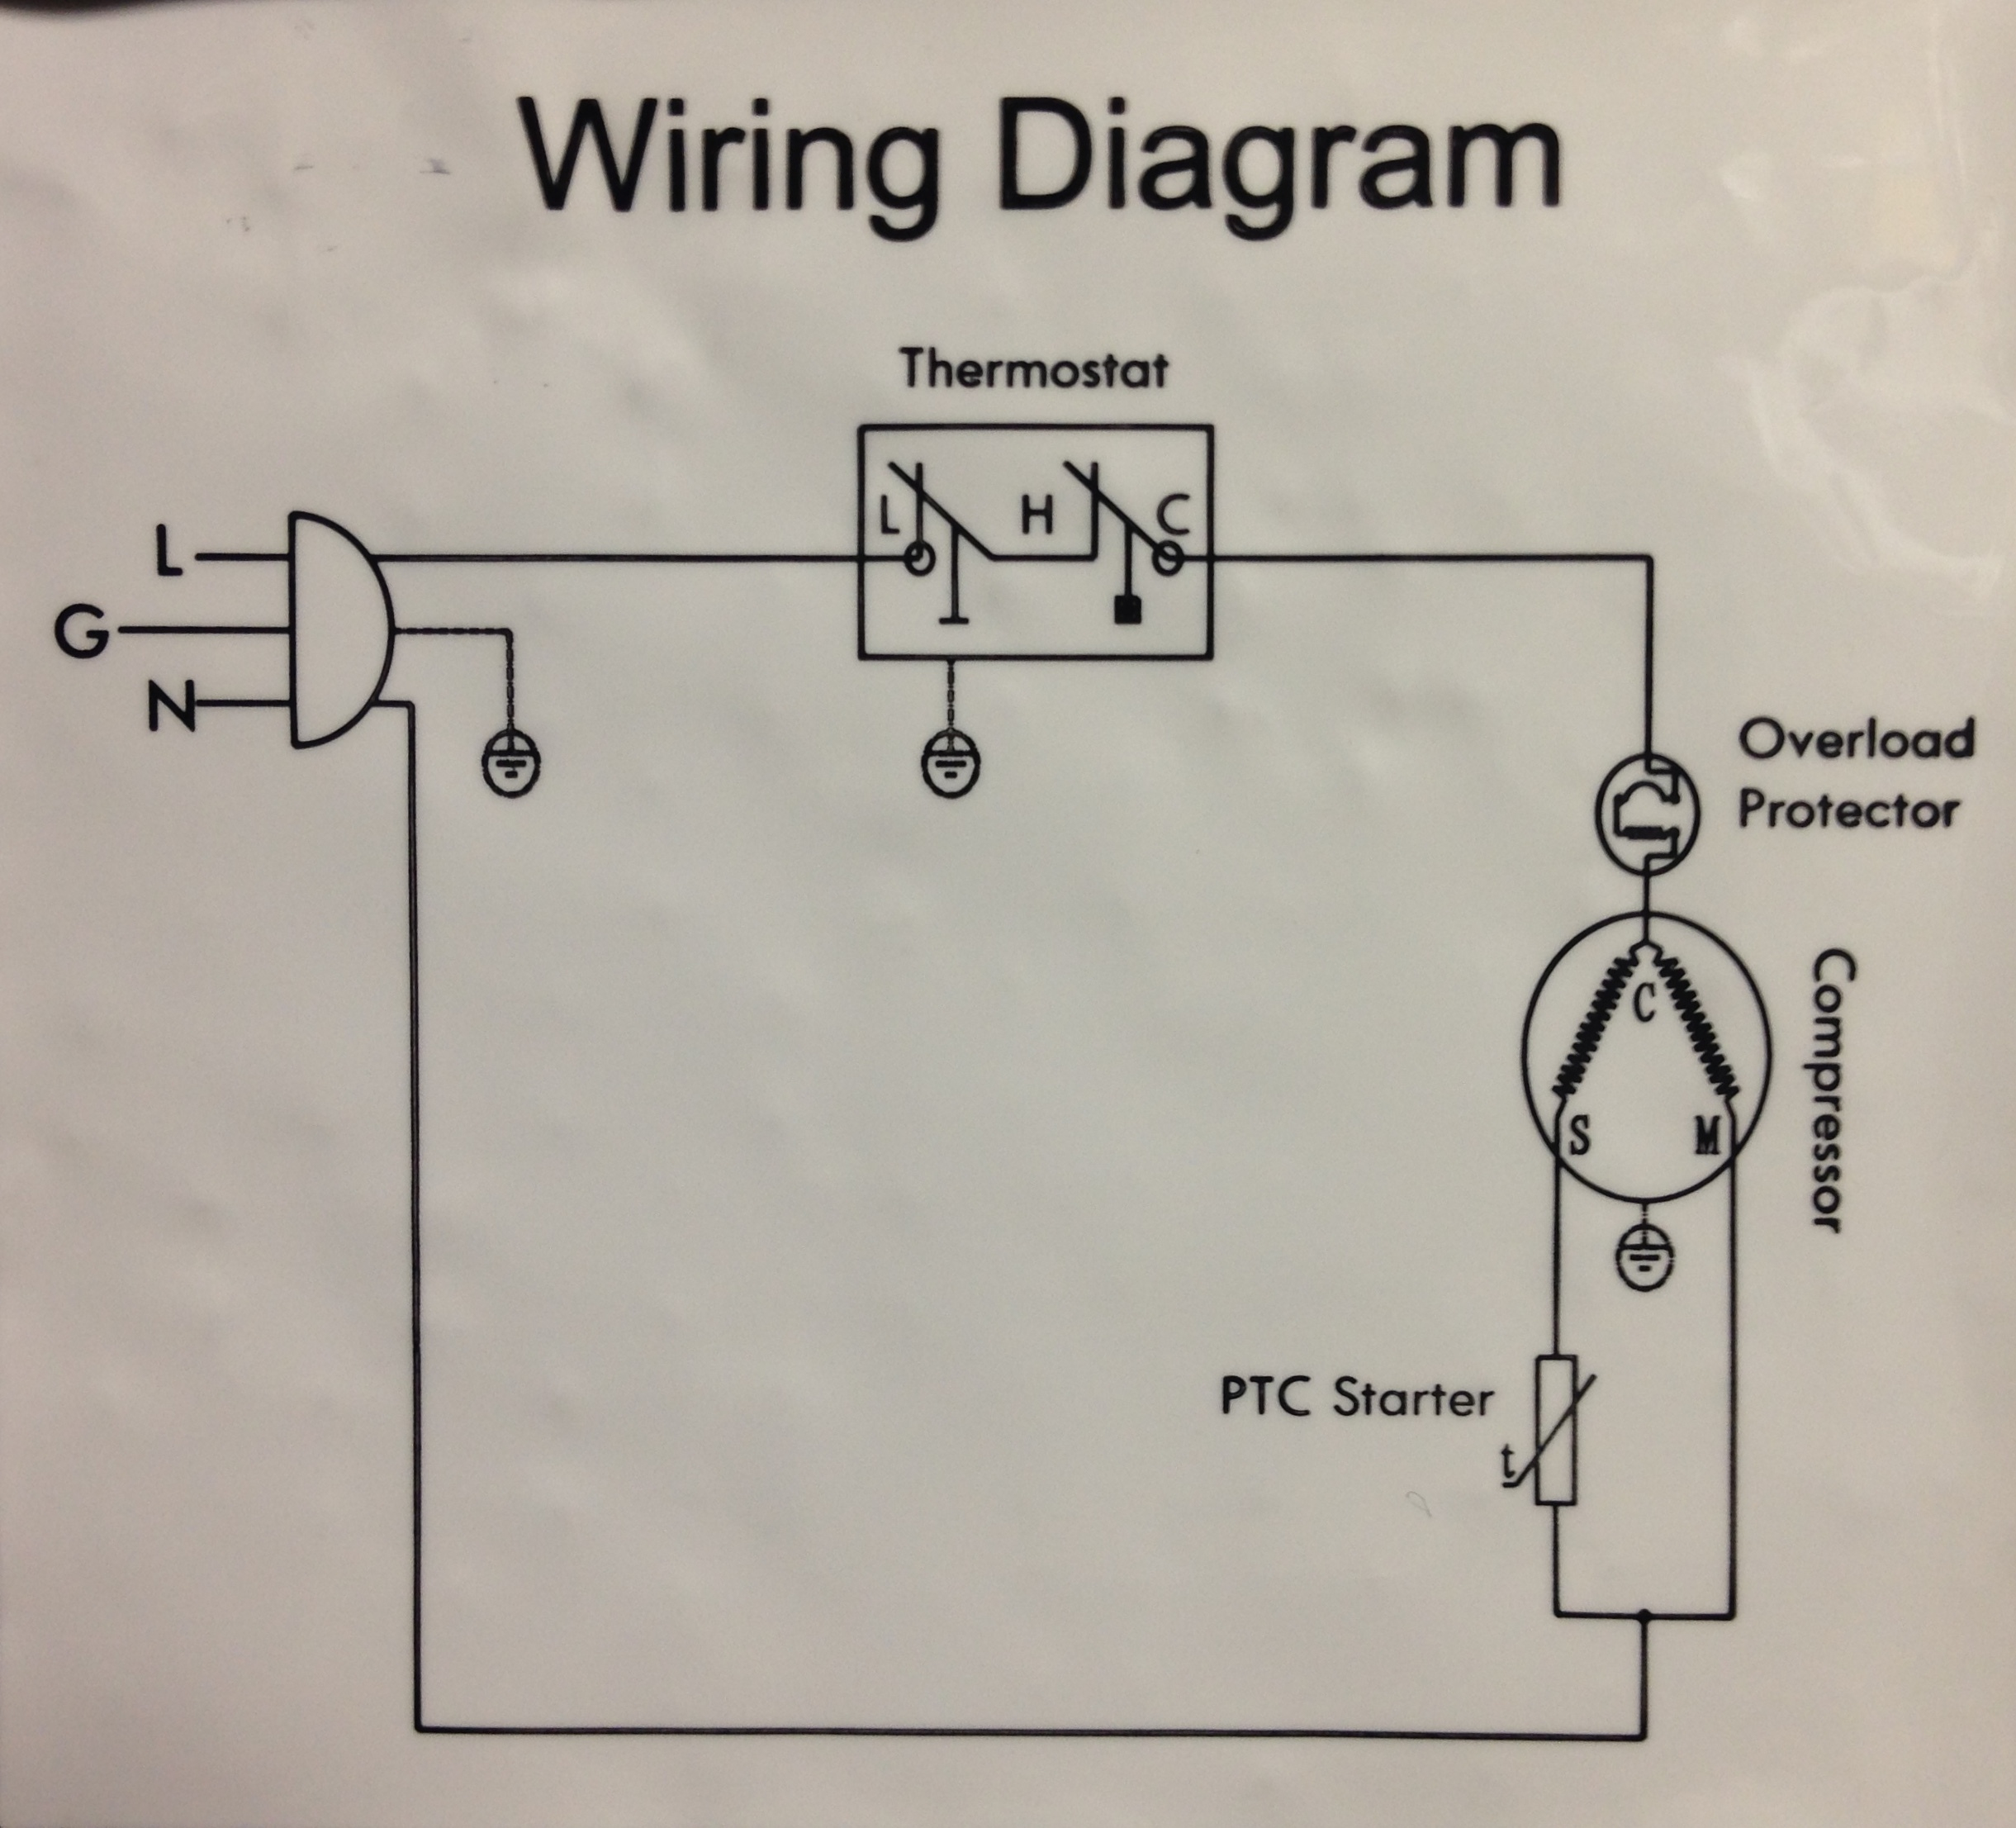 Refrigeration Compressor Wiring Diagram | Manual E-Books - Refrigerator Compressor Wiring Diagram